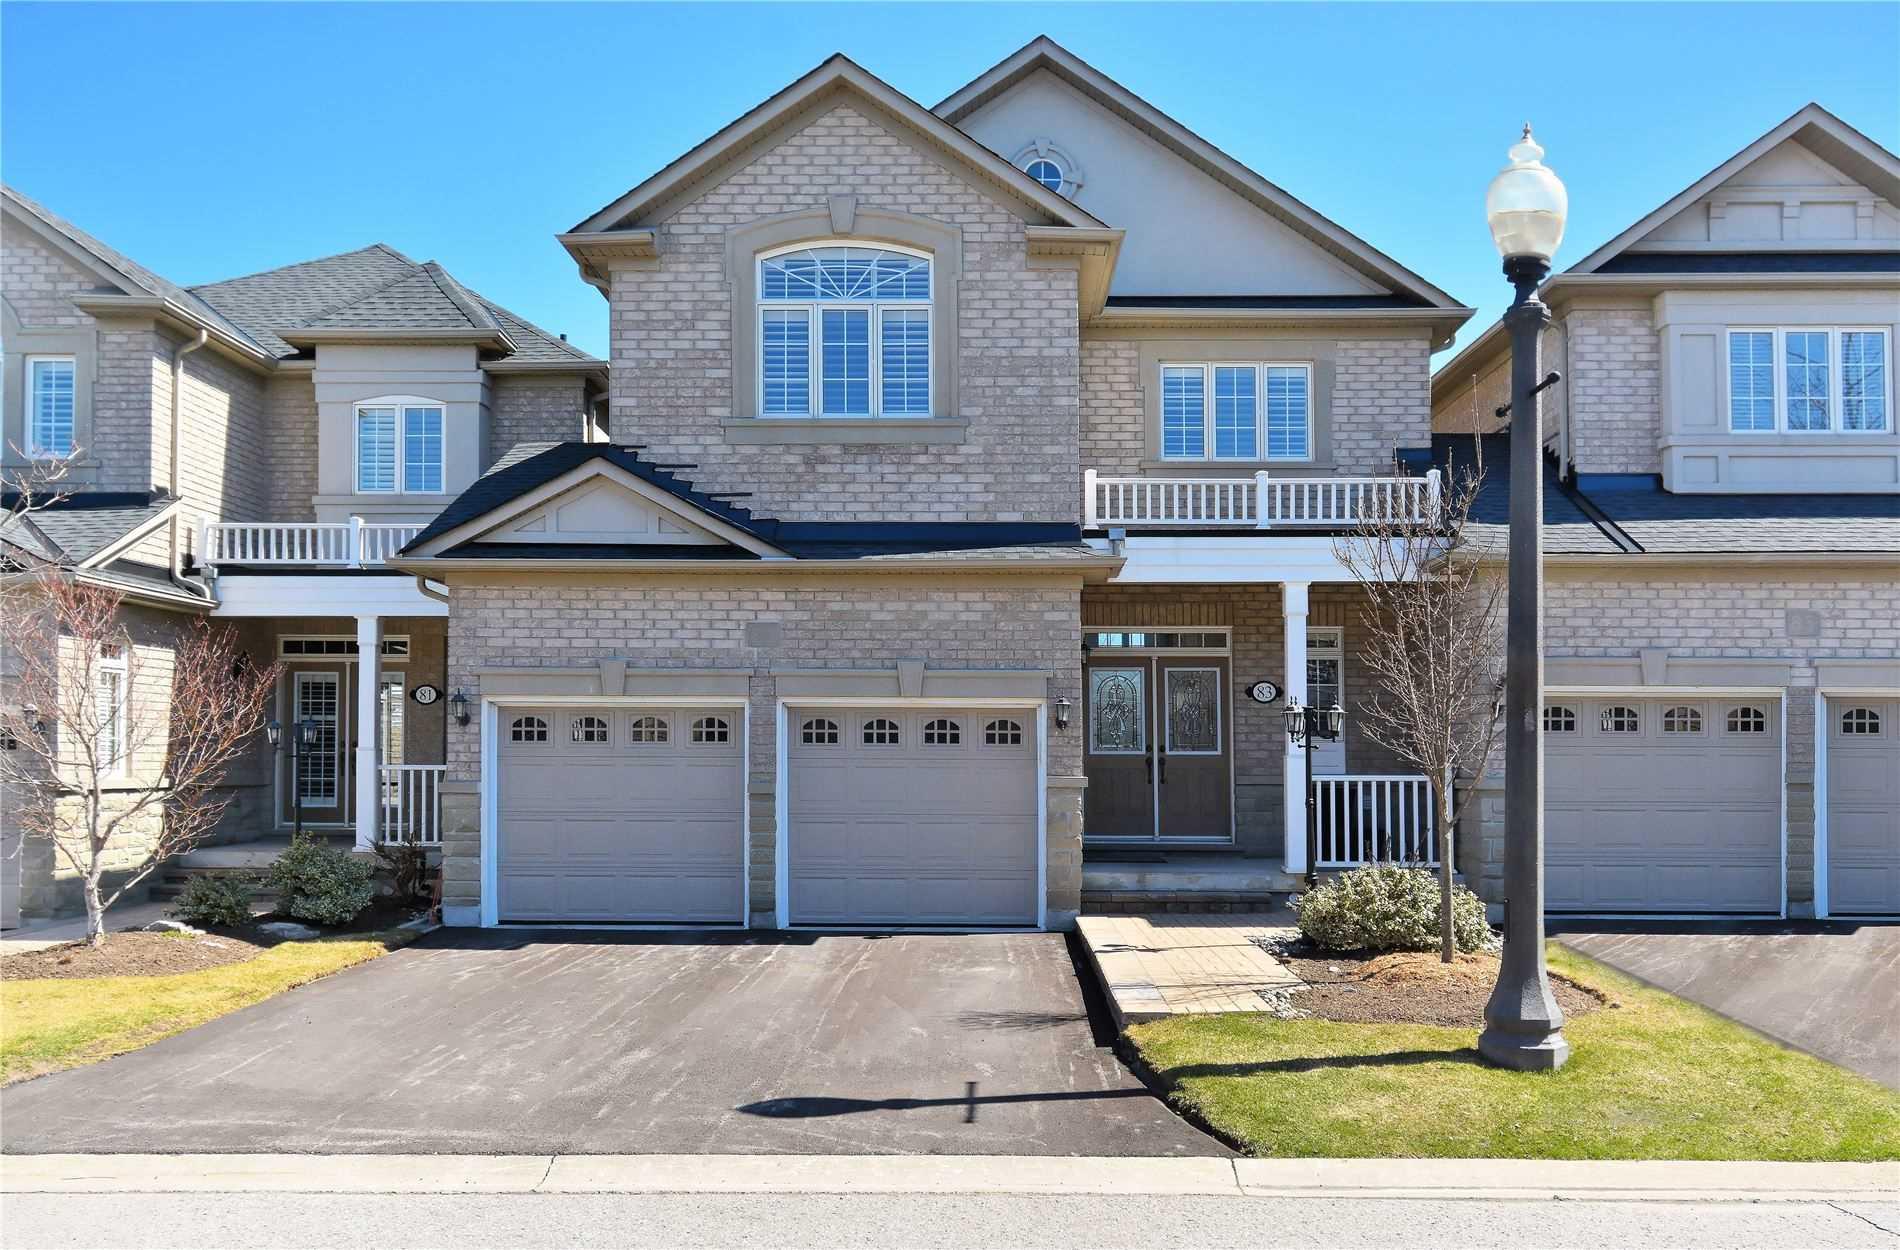 83 Stonecliffe Cres, Aurora Ontario, Canada